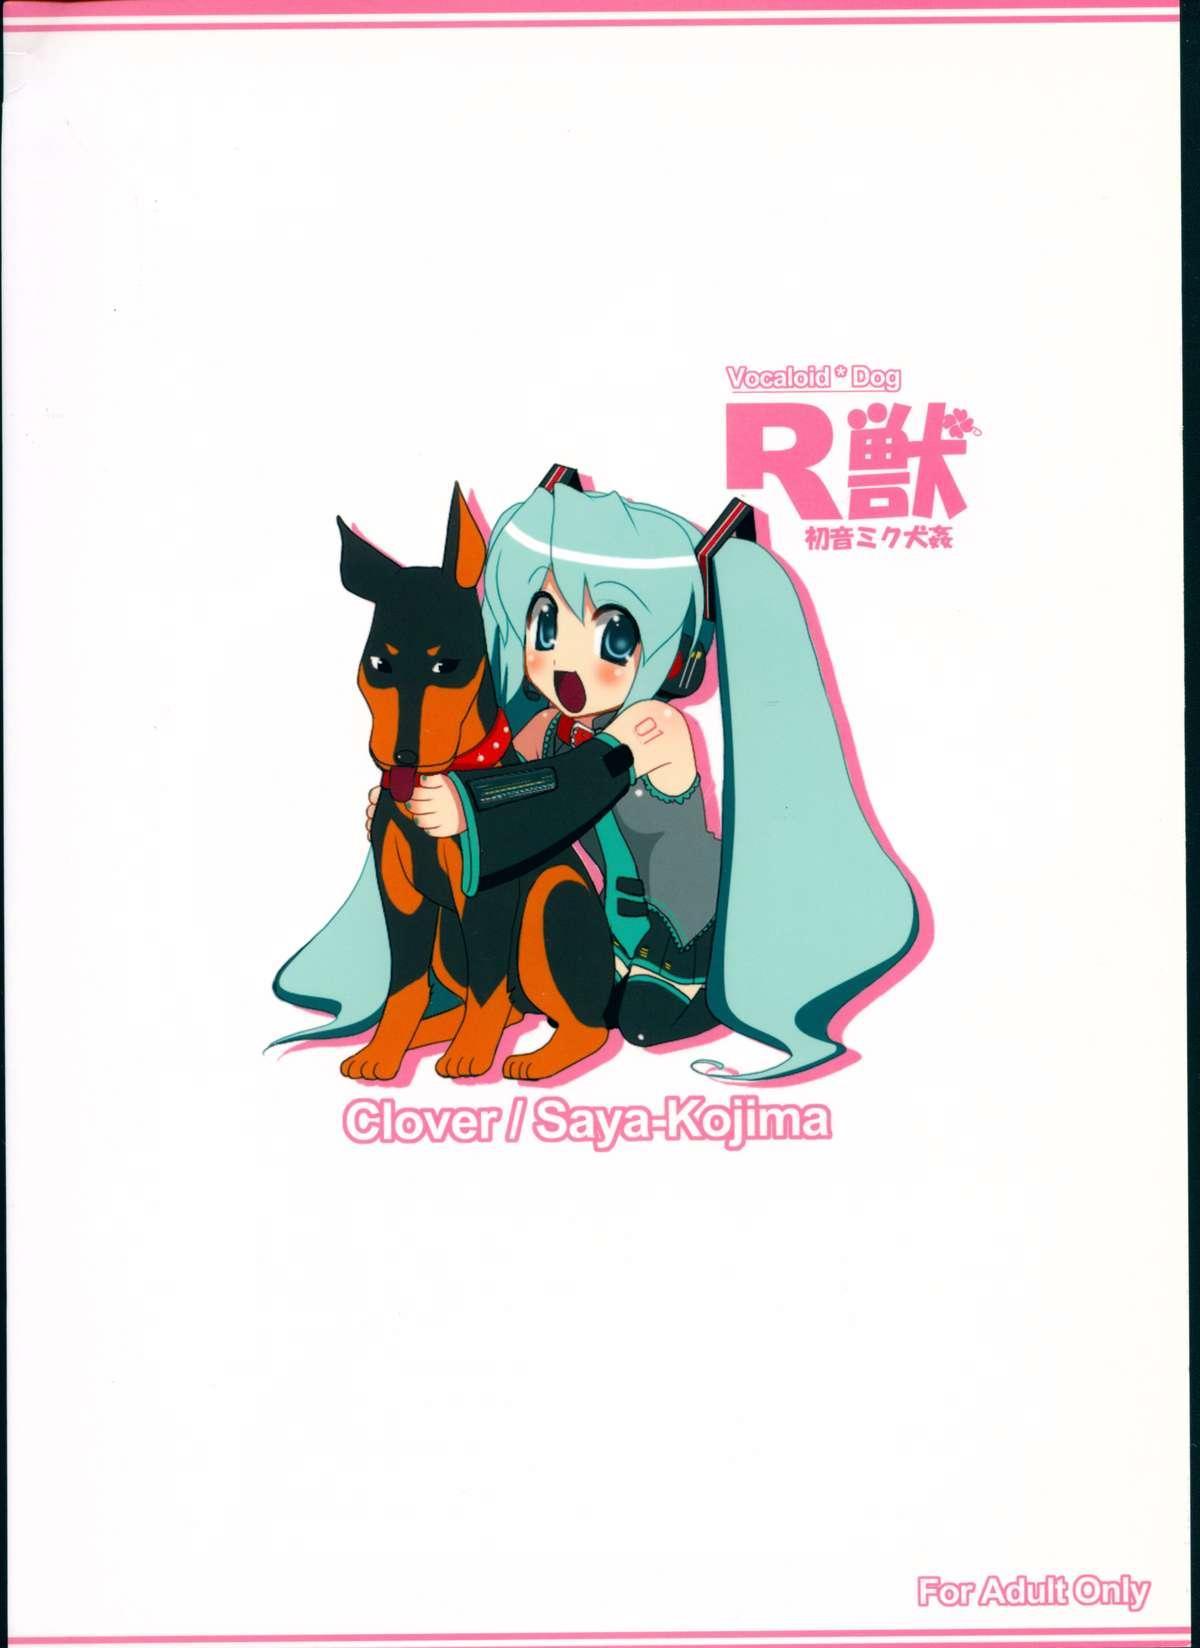 R Juu - Hatsune Miku Kenkan 0